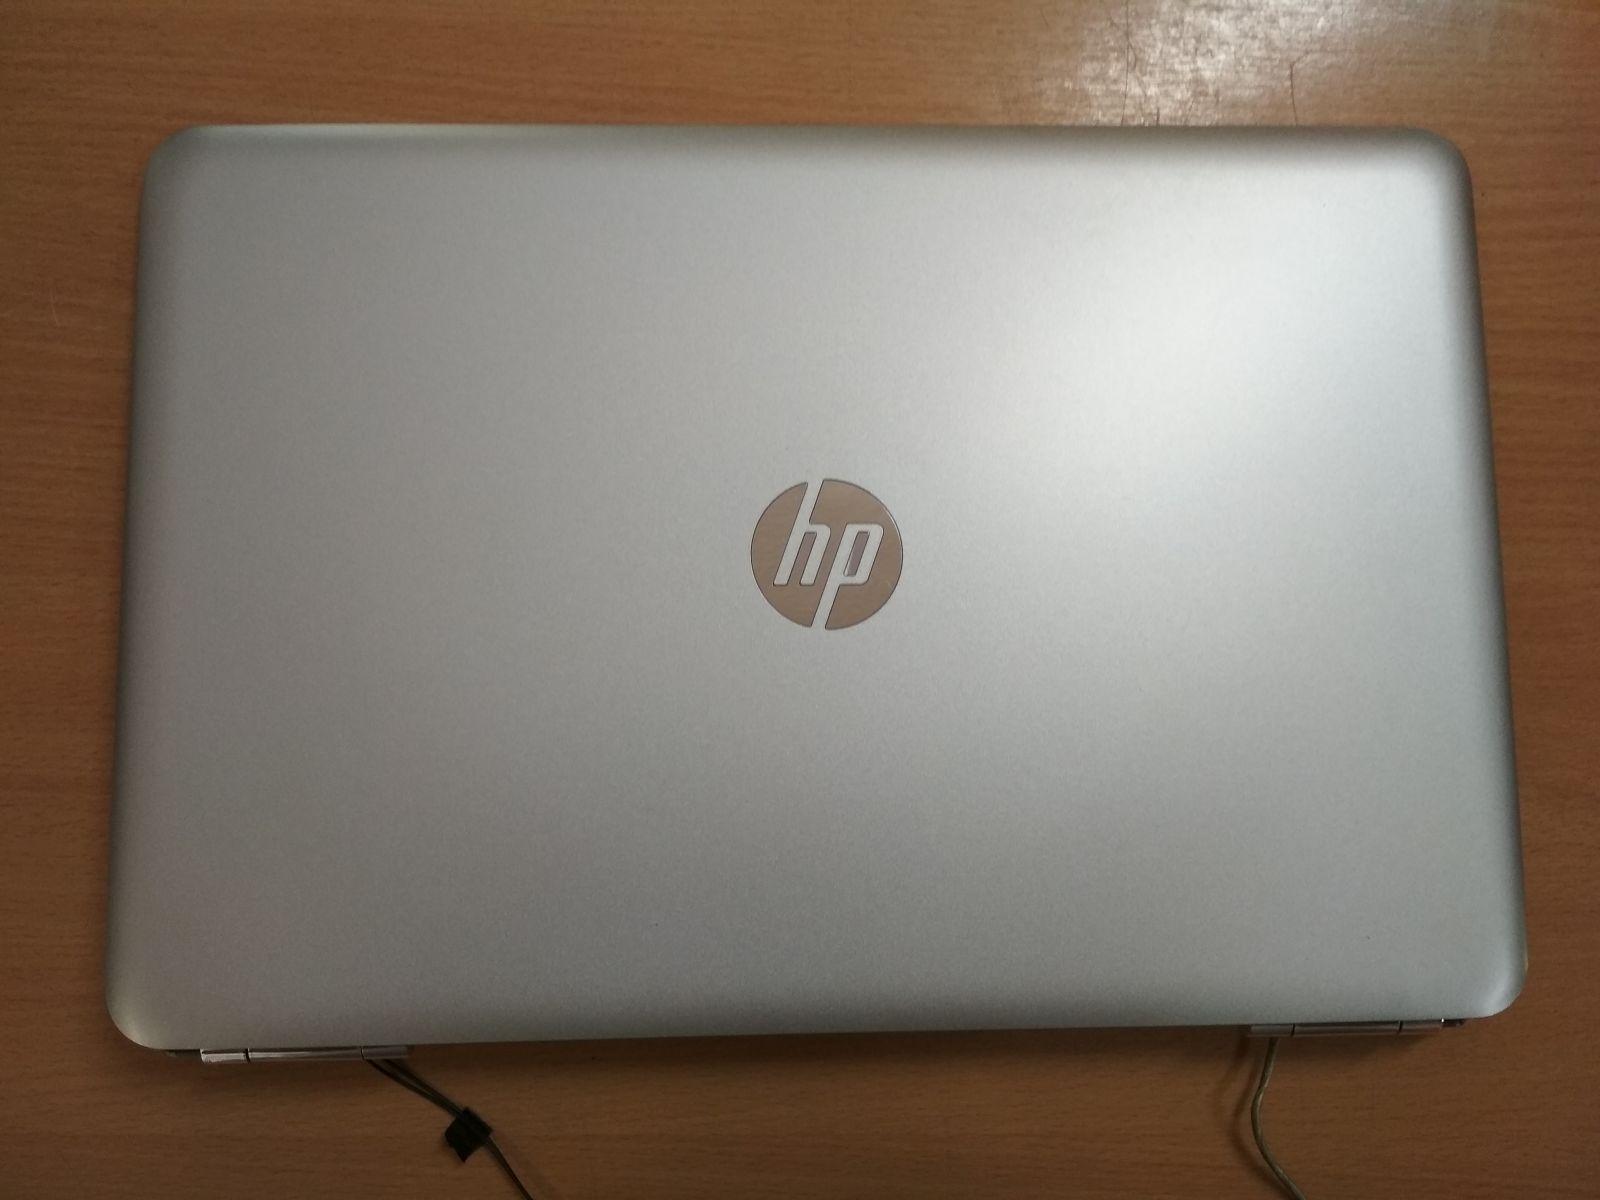 HP Pavilion 15-bc komplett LCD fedlap TFQ3LG35TP EAG35003A1N használt 1 hó gar!